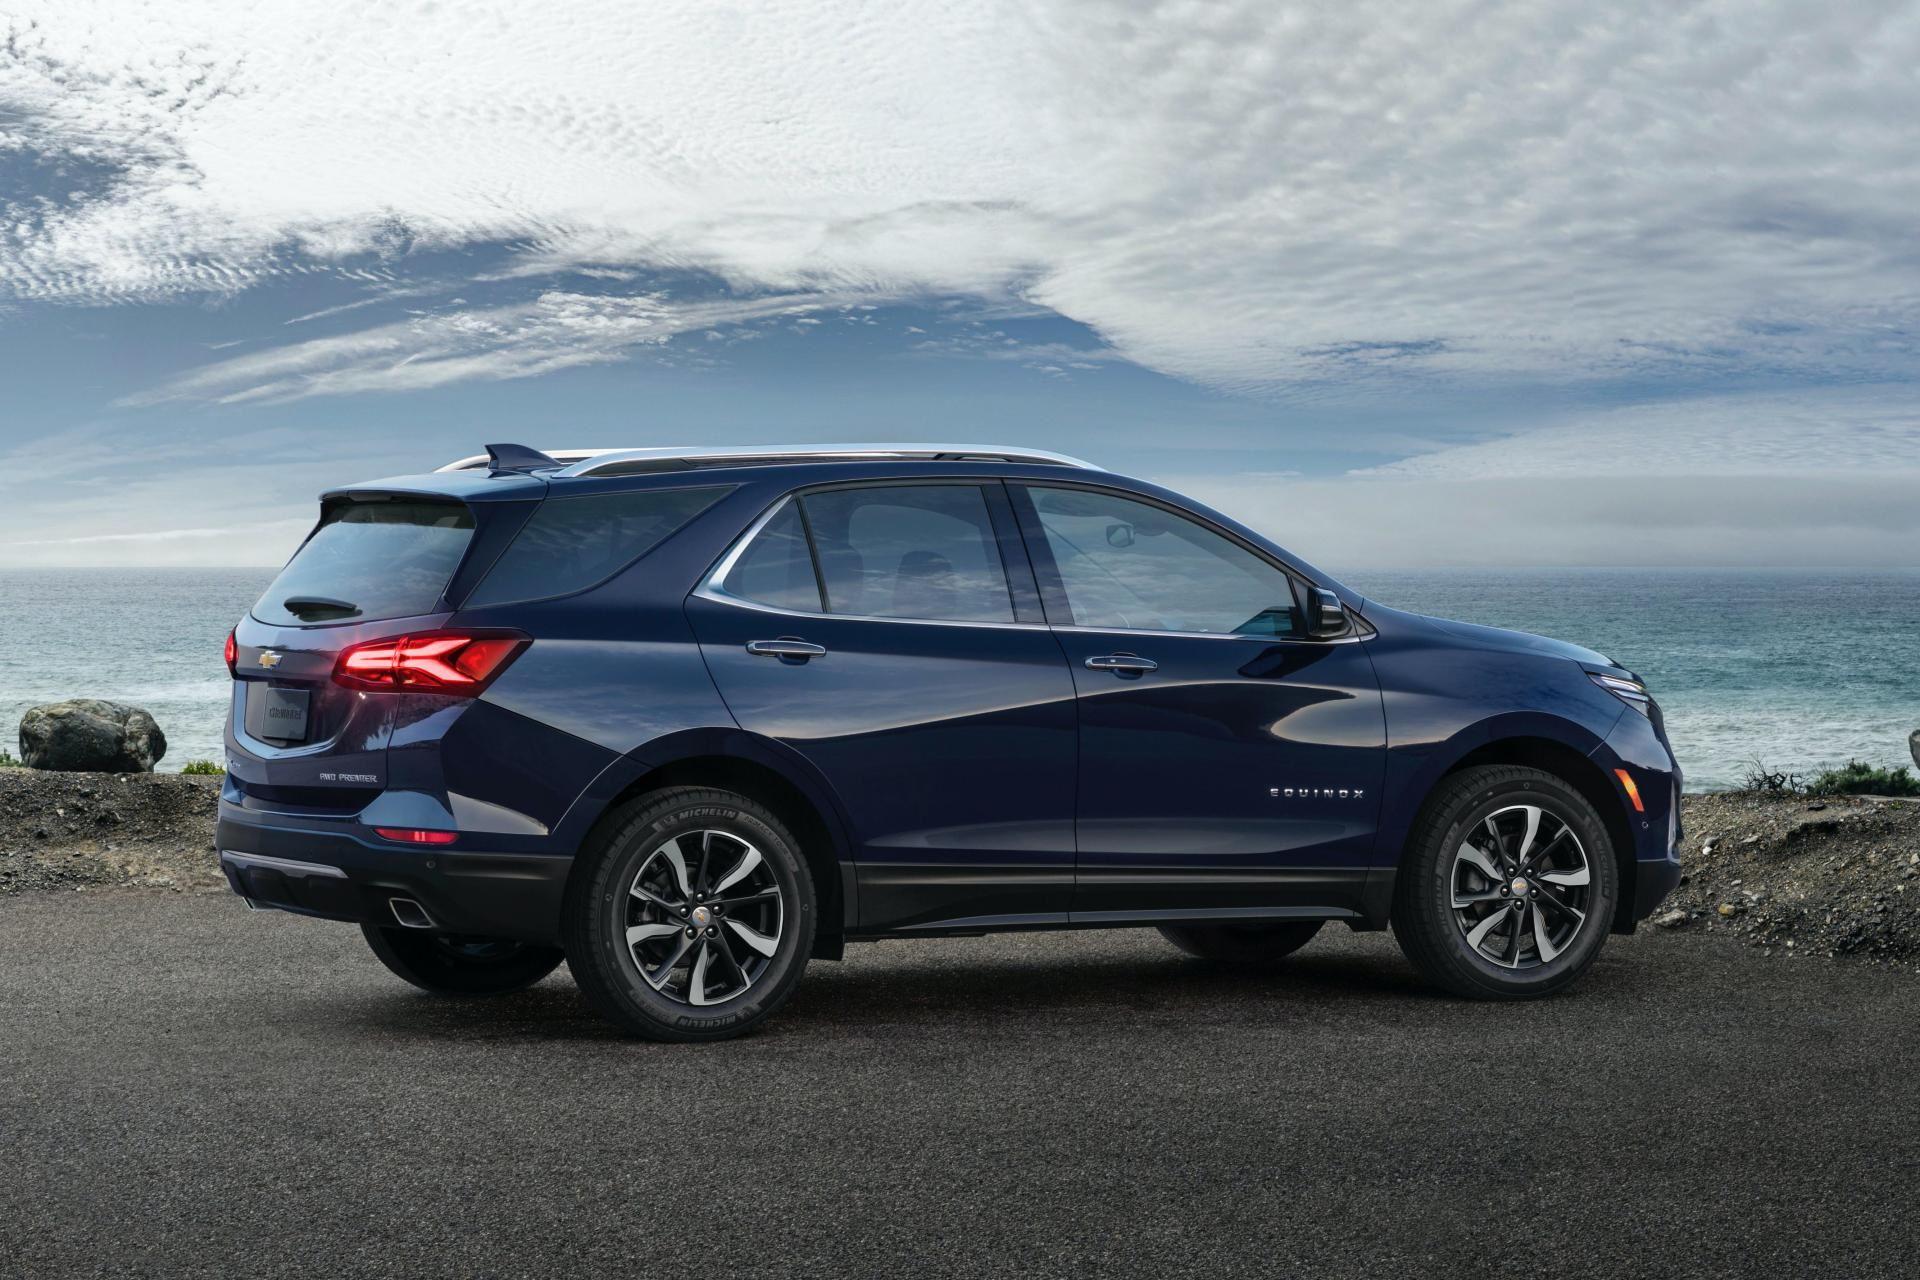 Chevrolet-Equinox-facelift-2020-15